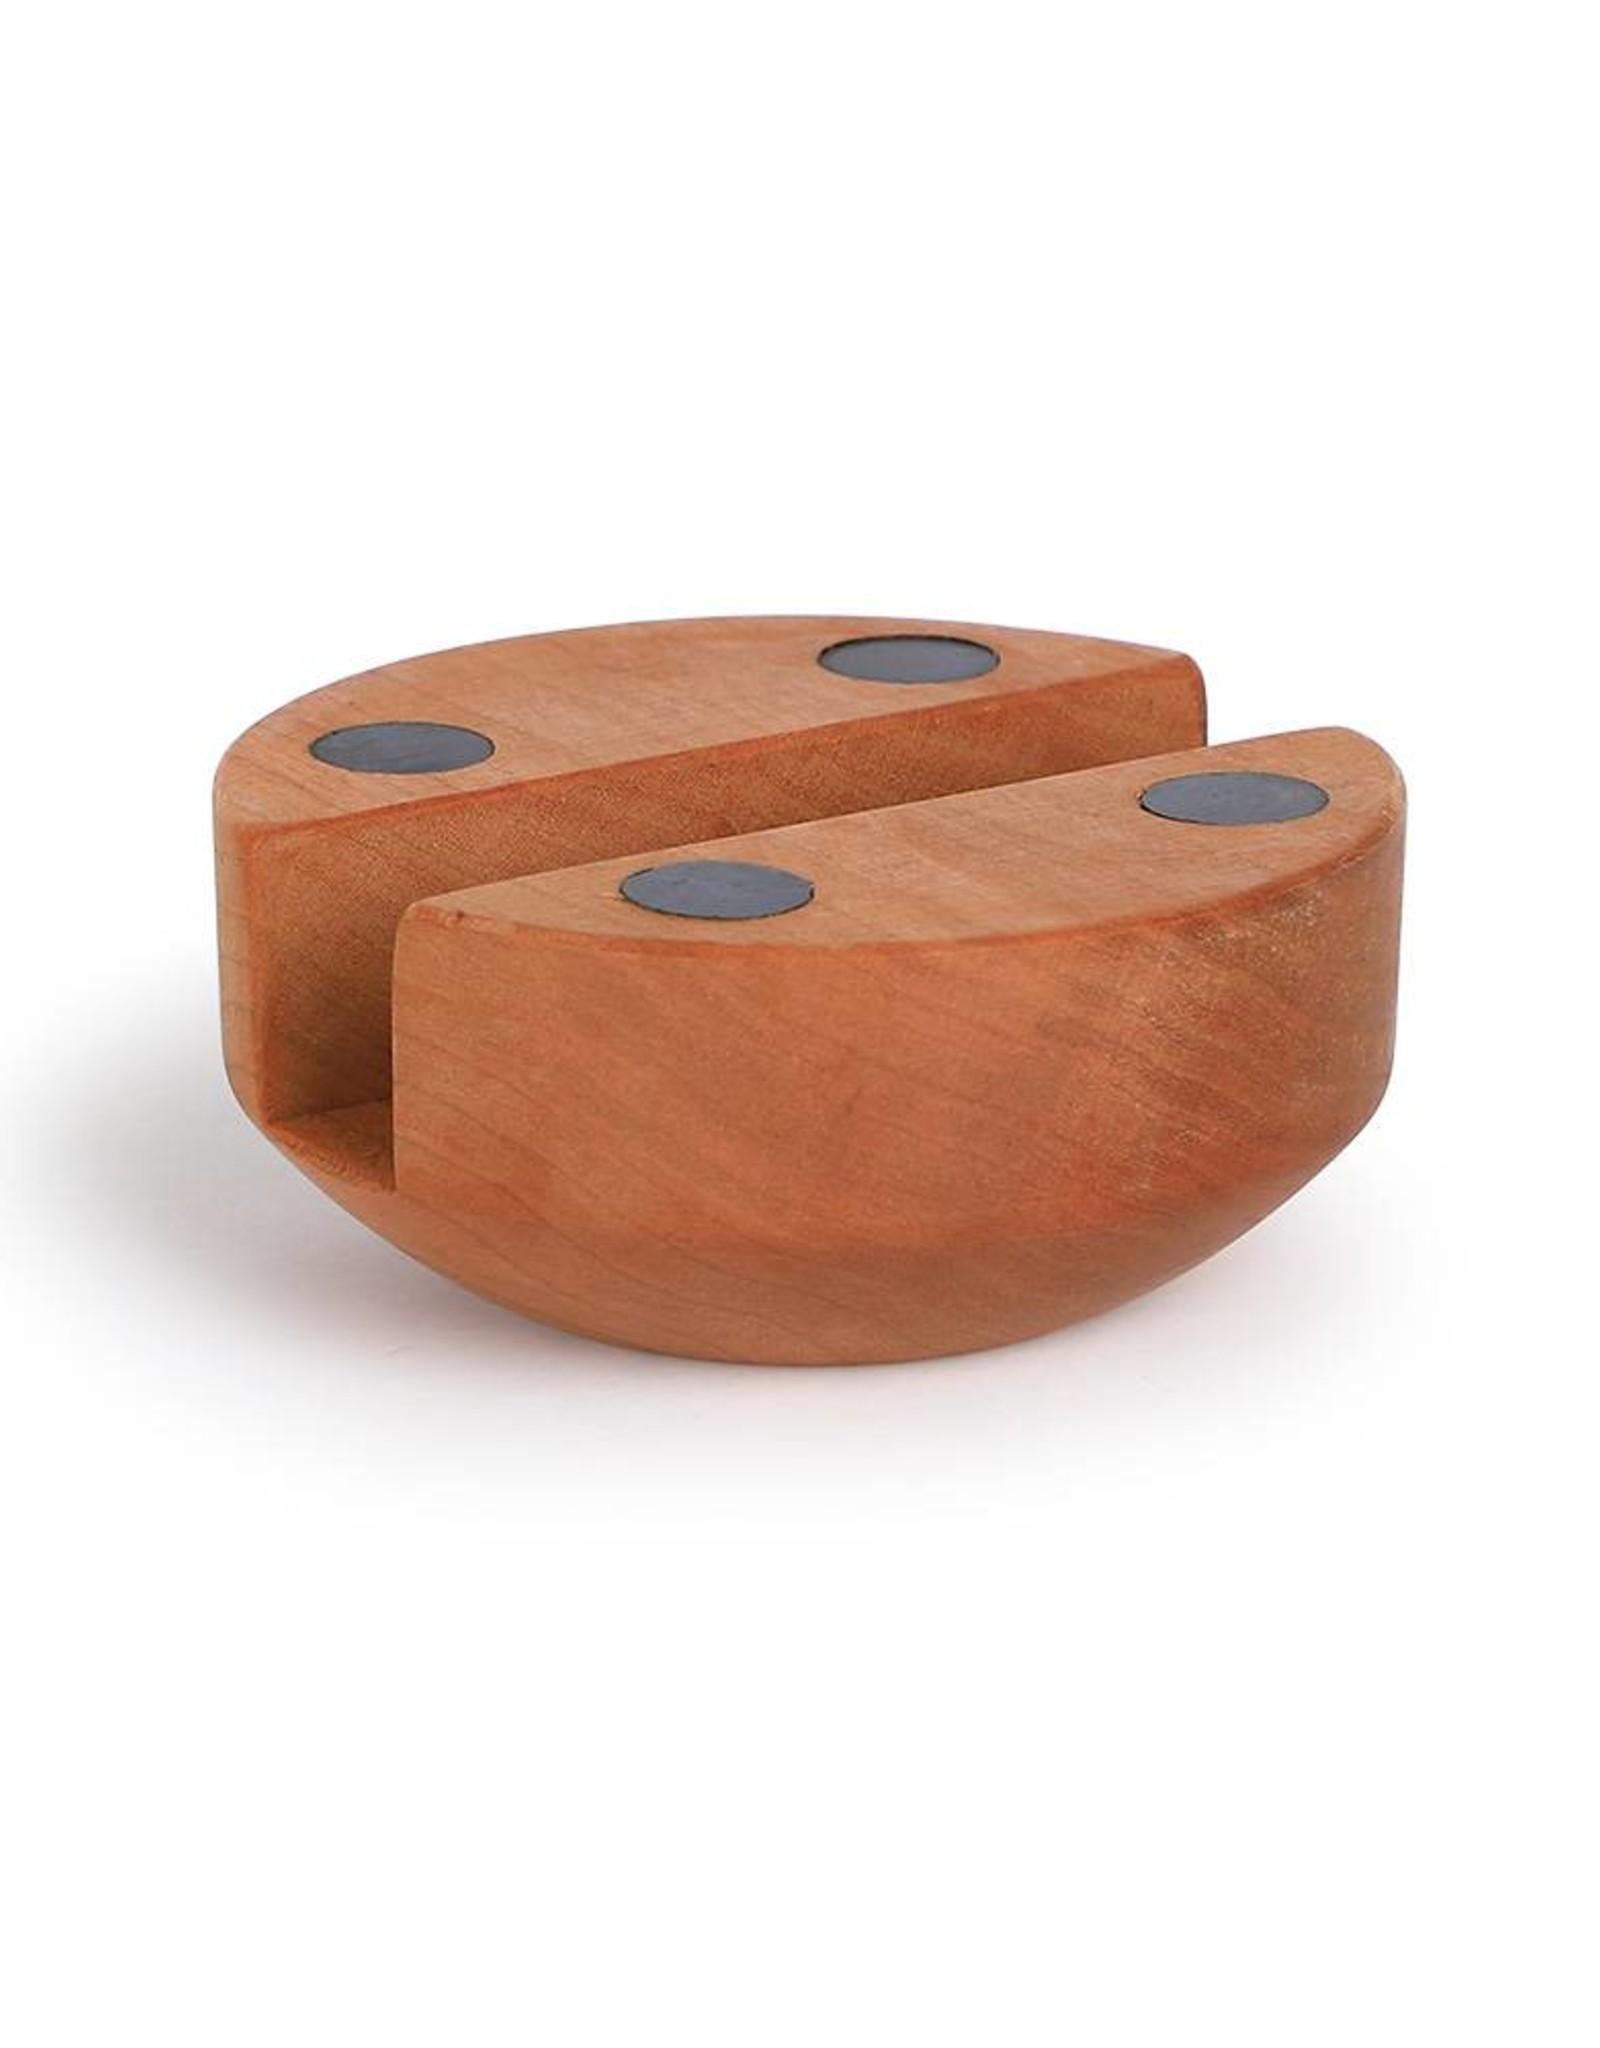 Vew-Do Vew-Do Magnetic Wobble Rock 360°-Wackelunterlage